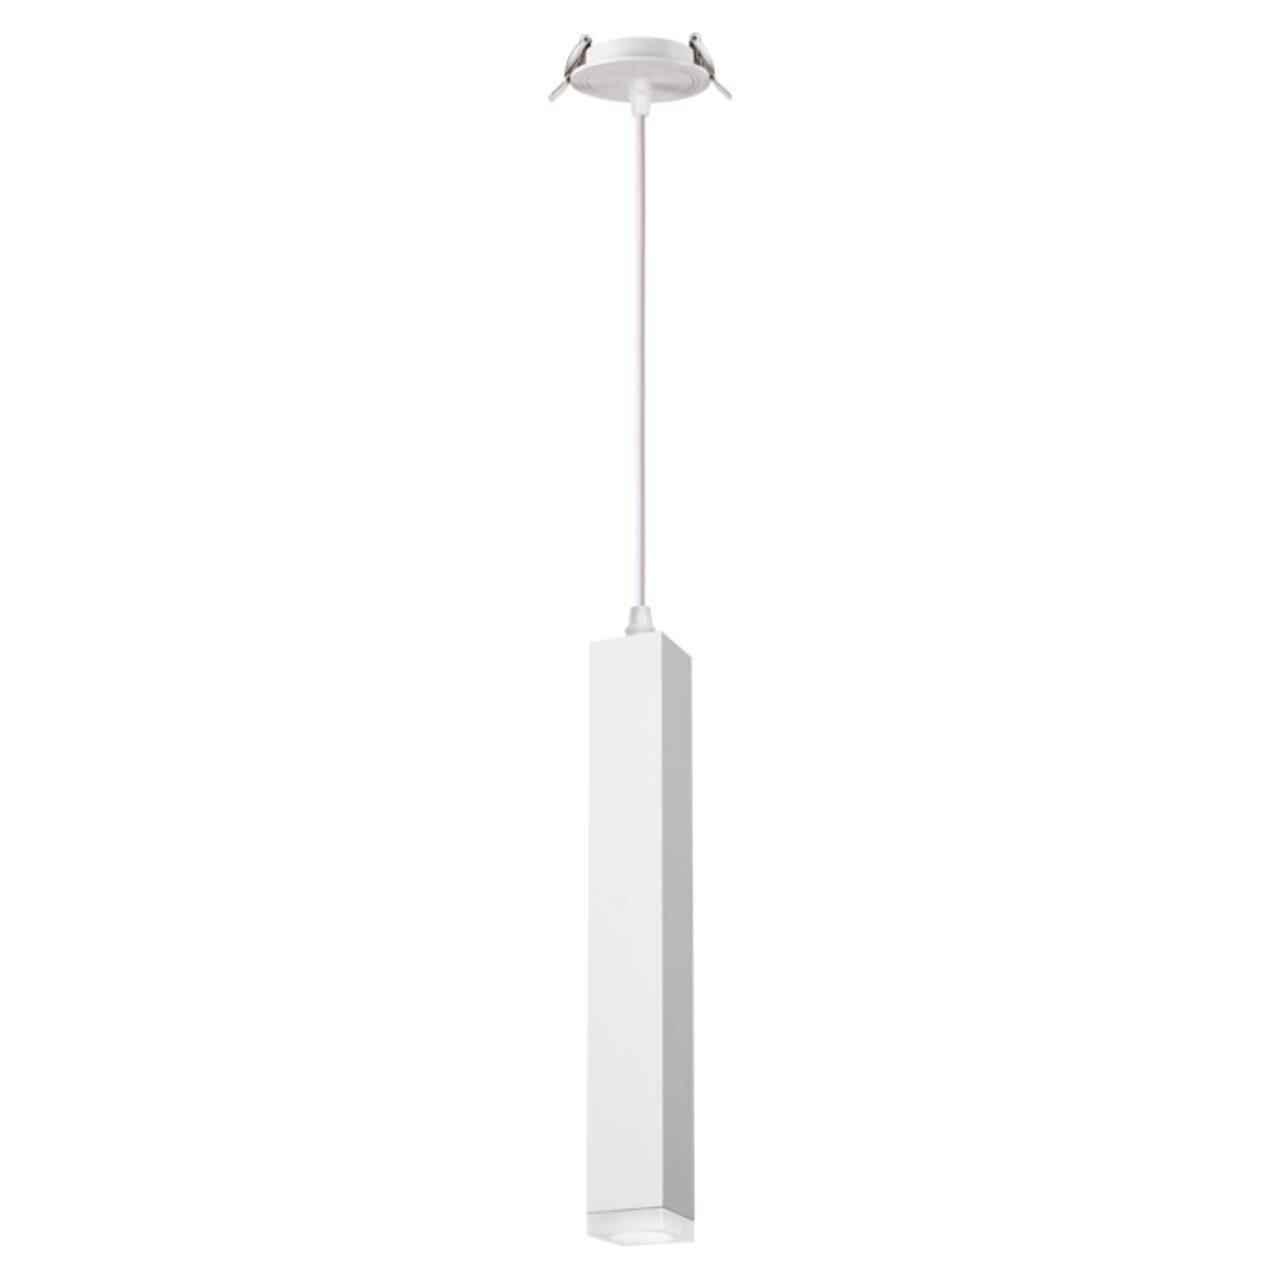 357898 SPOT NT19 069 белый Встраиваемый светильник IP20 LED 3000K 12W 160-265V MODO